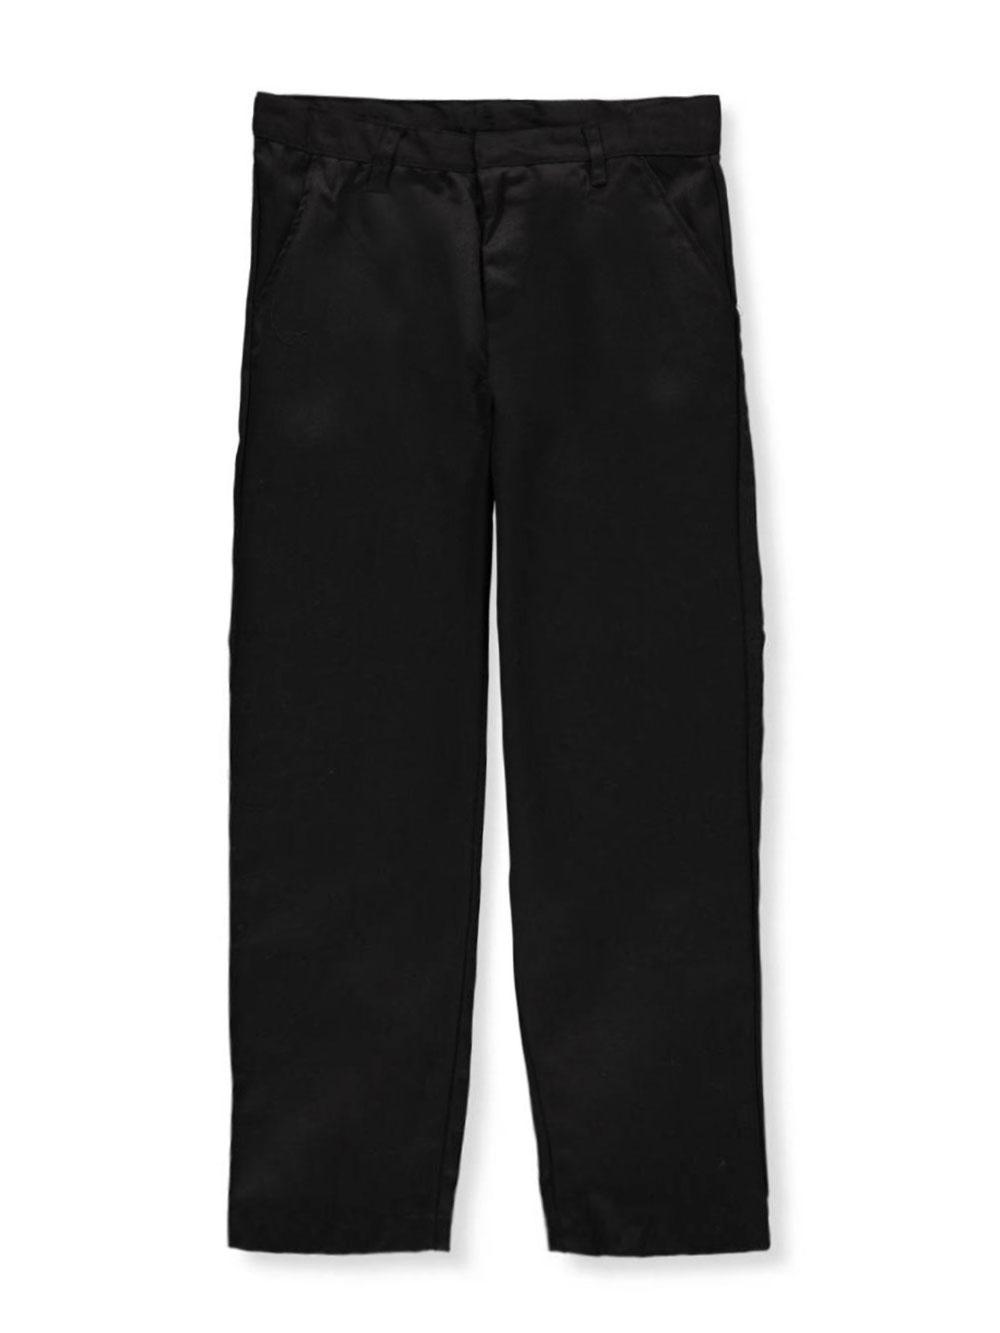 Khaki Galaxy Big Boys School Uniform Slim Pants 18 Husky